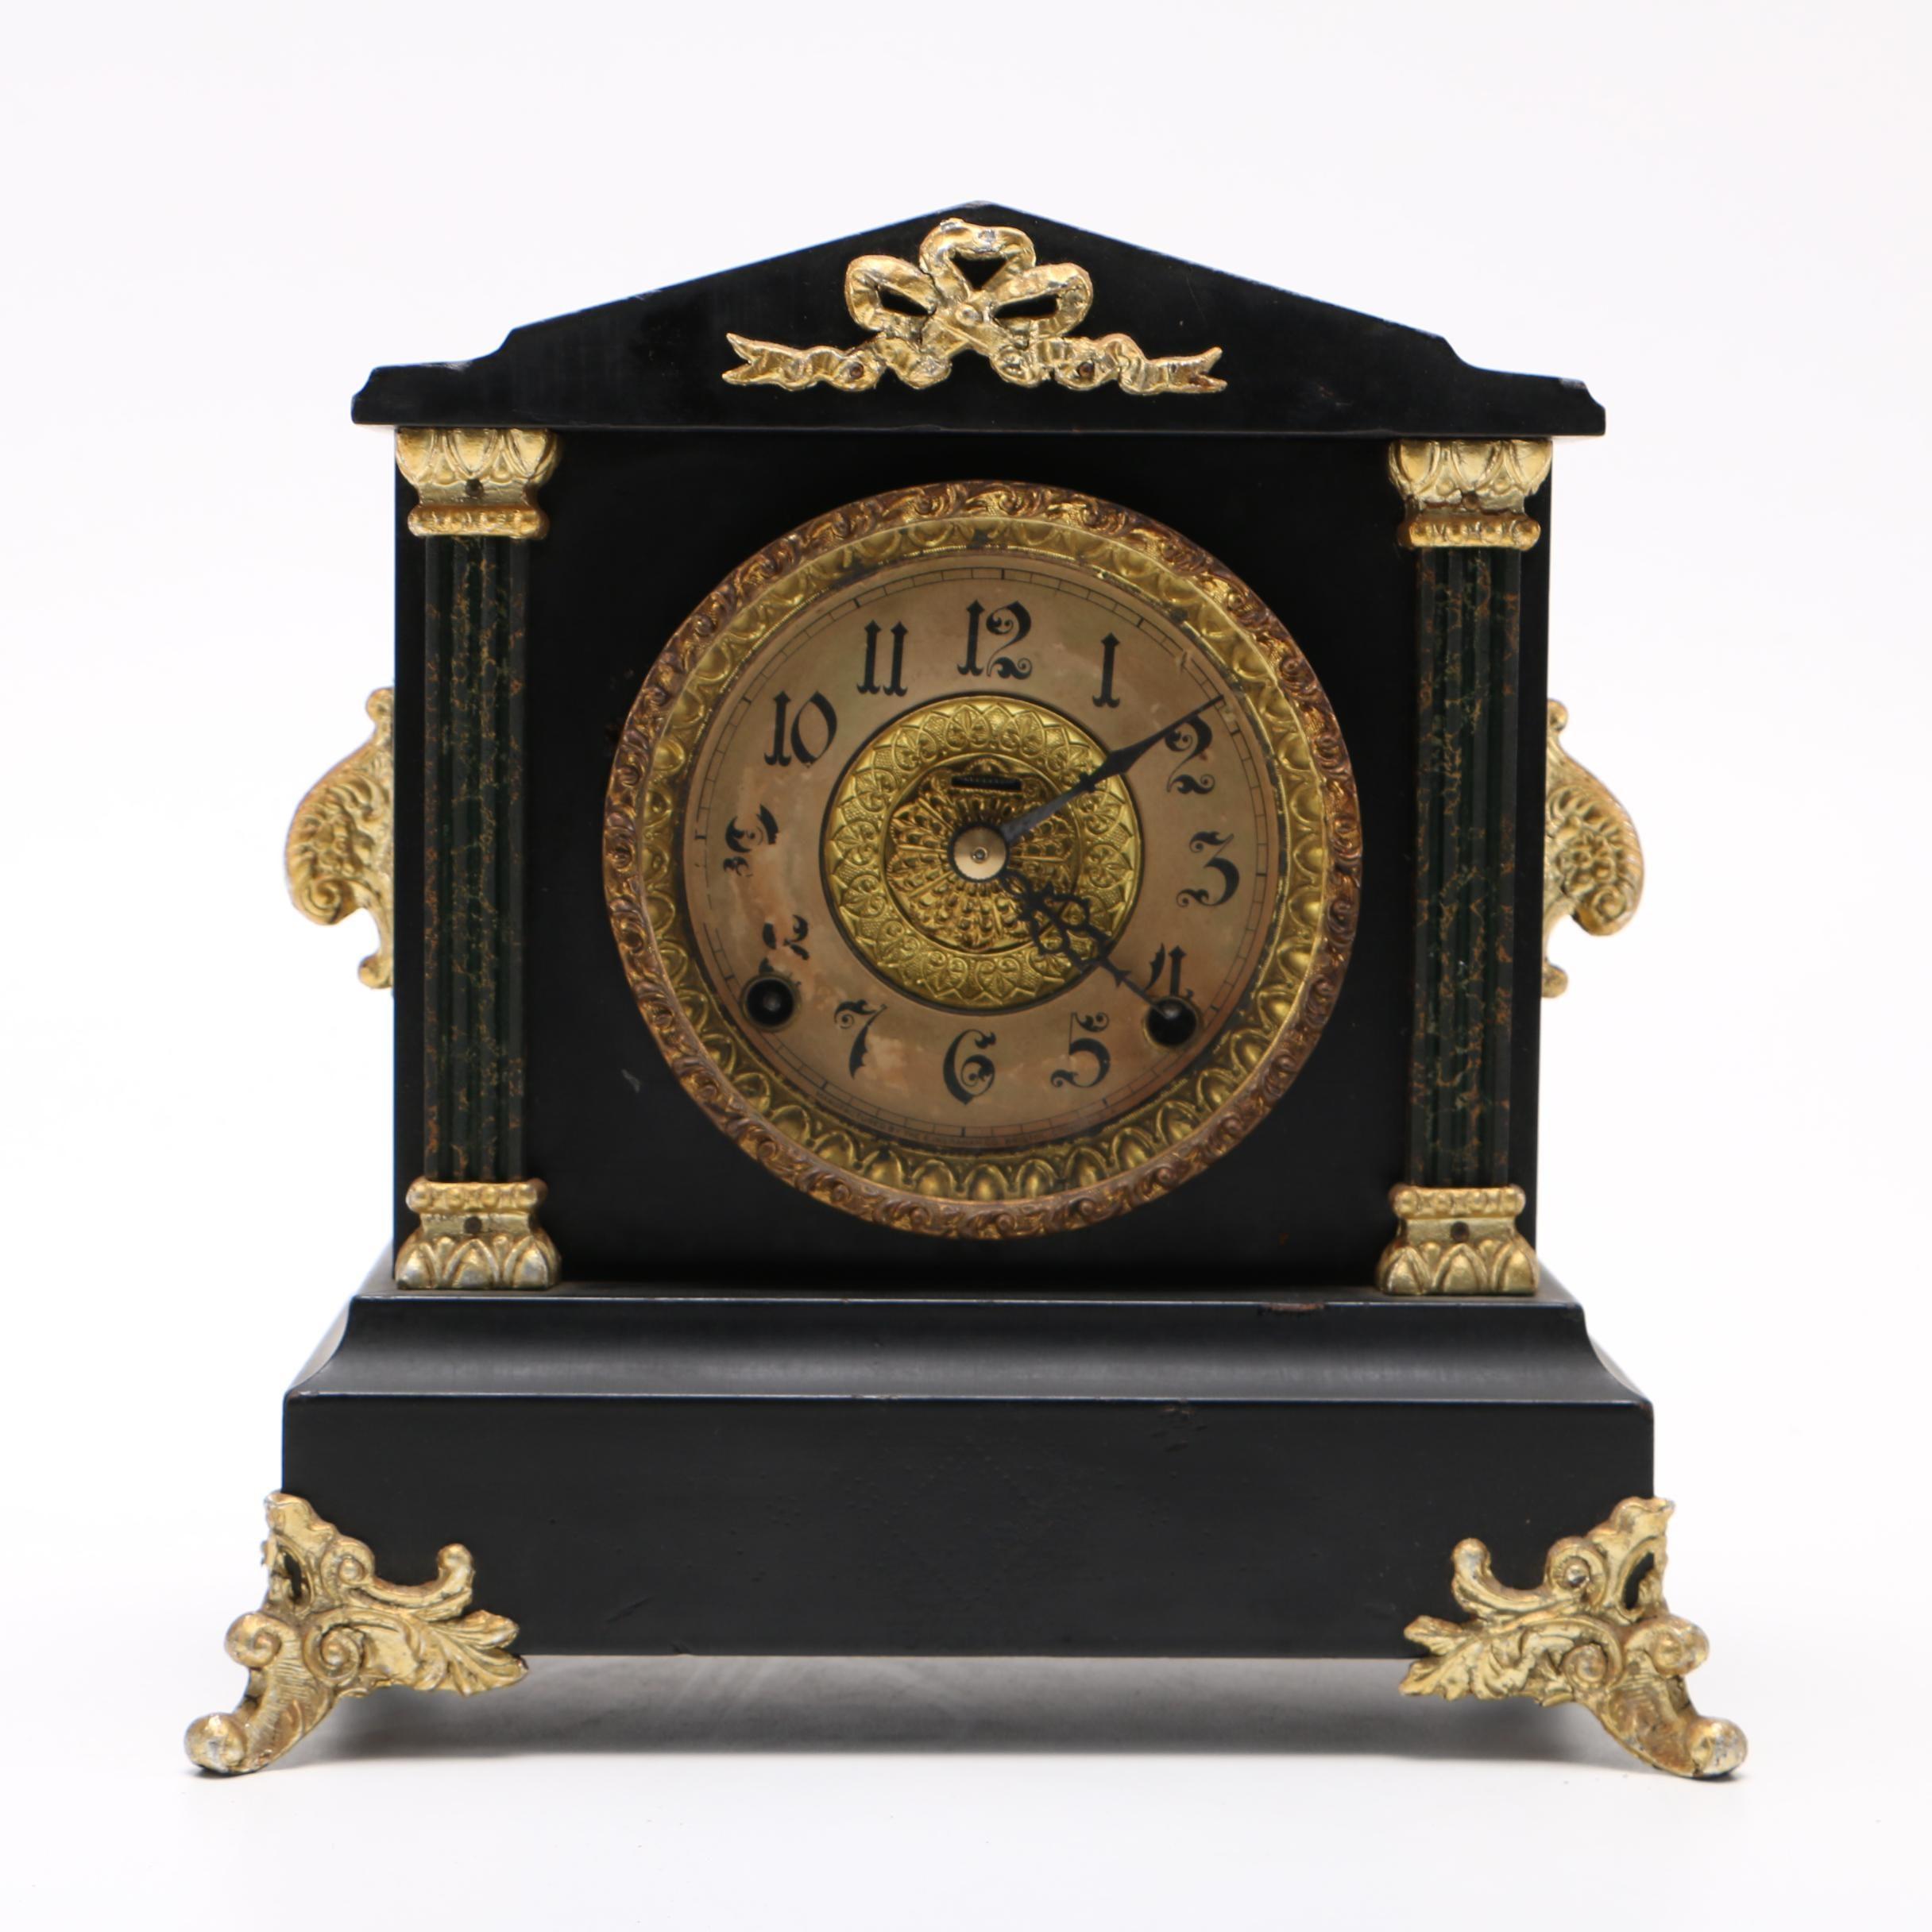 Black and Gold Tone Ornate Mantel Clock